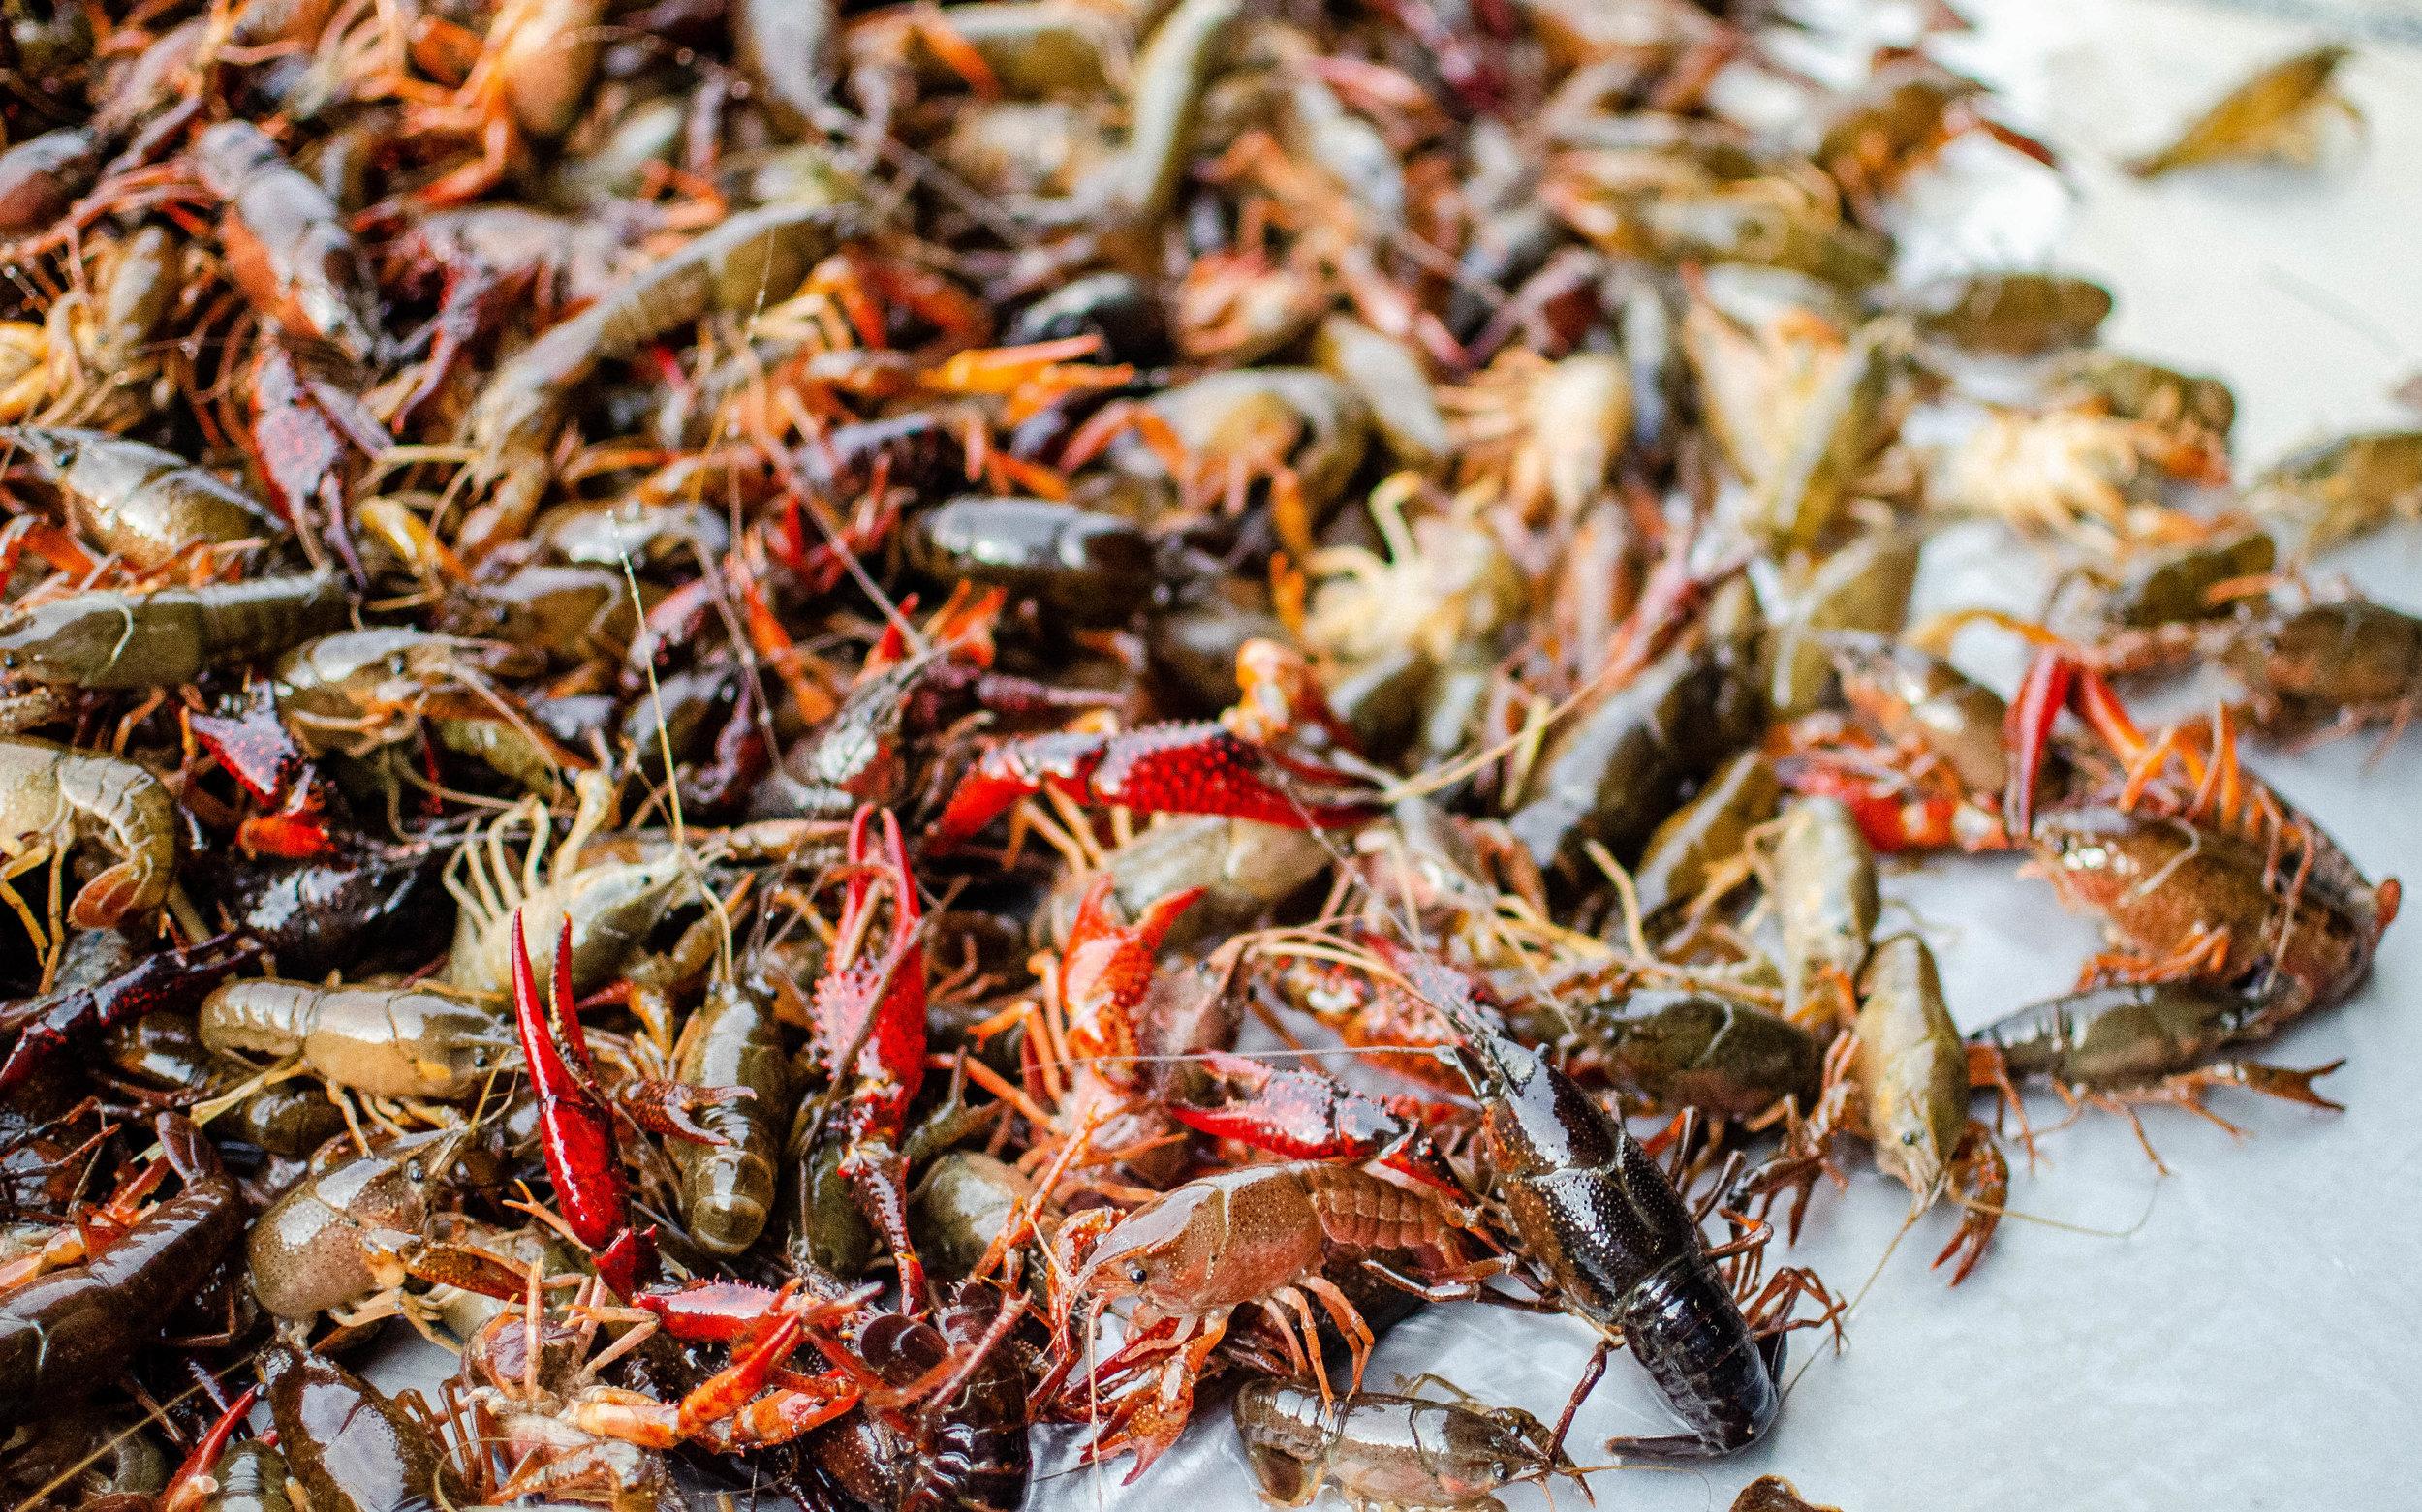 LIVE CRAWFISH — Southern Select Crawfish